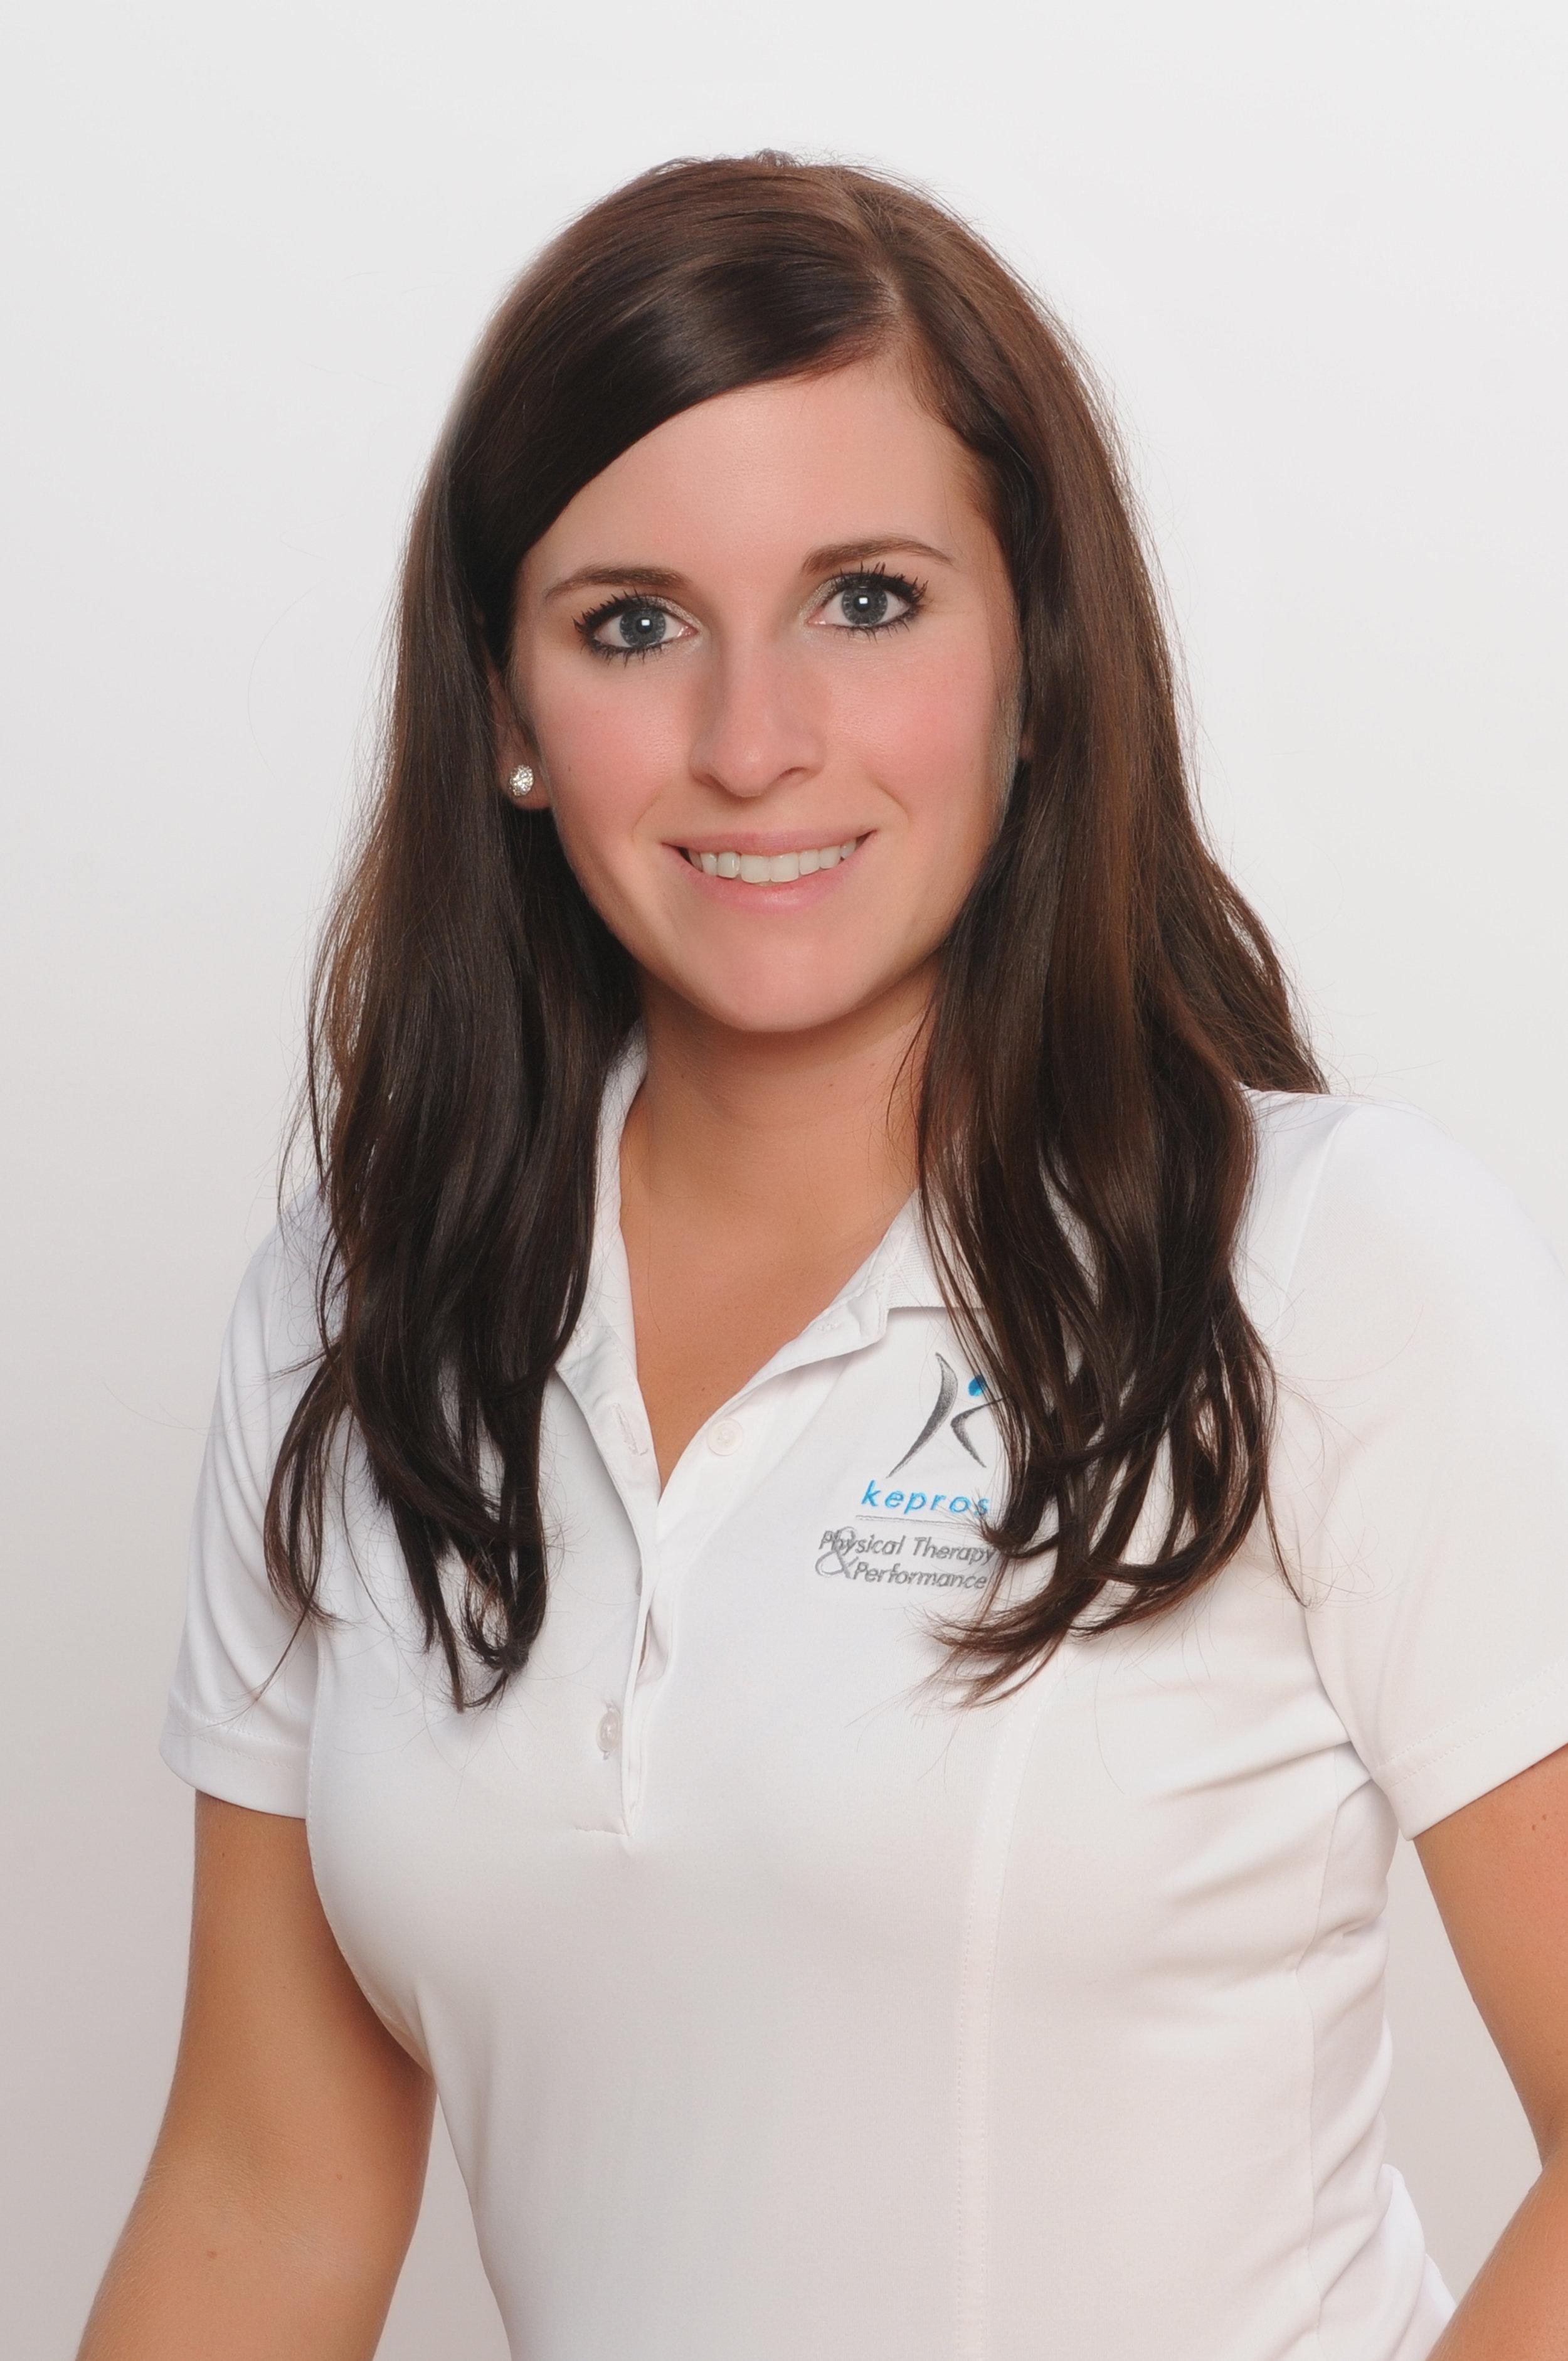 Jennifer Ryan, PTA